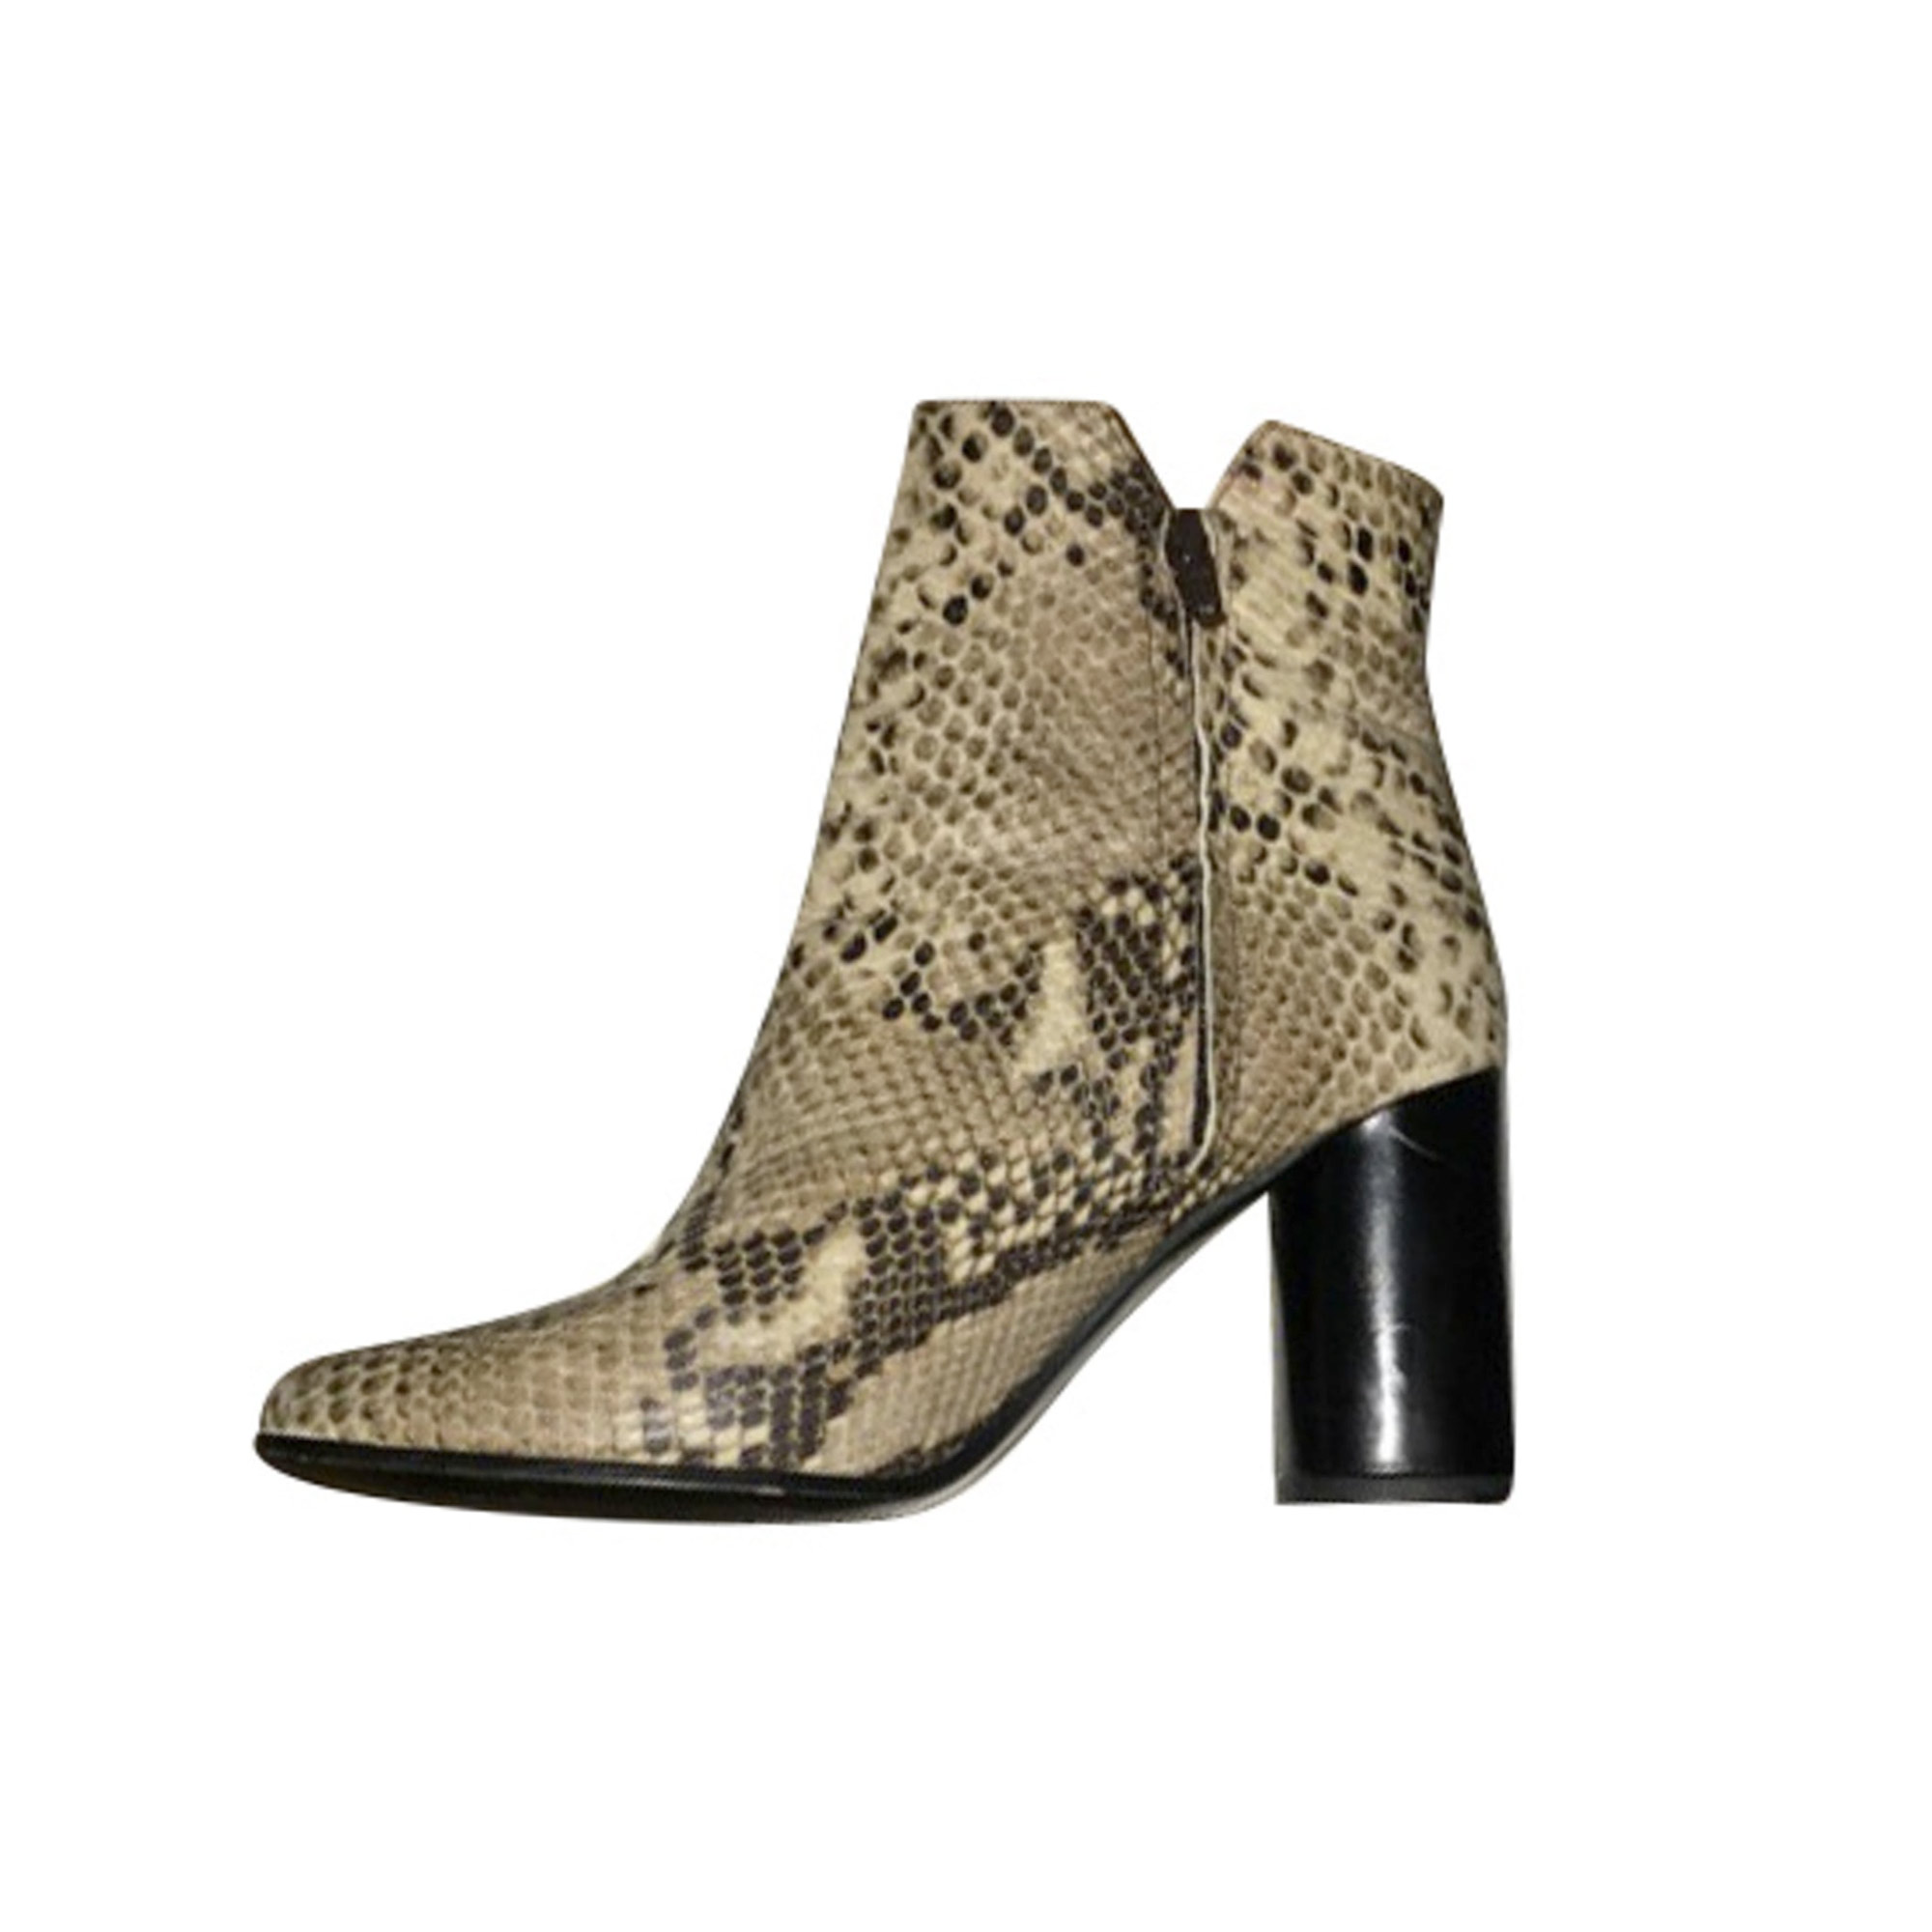 Bottines & low boots femme